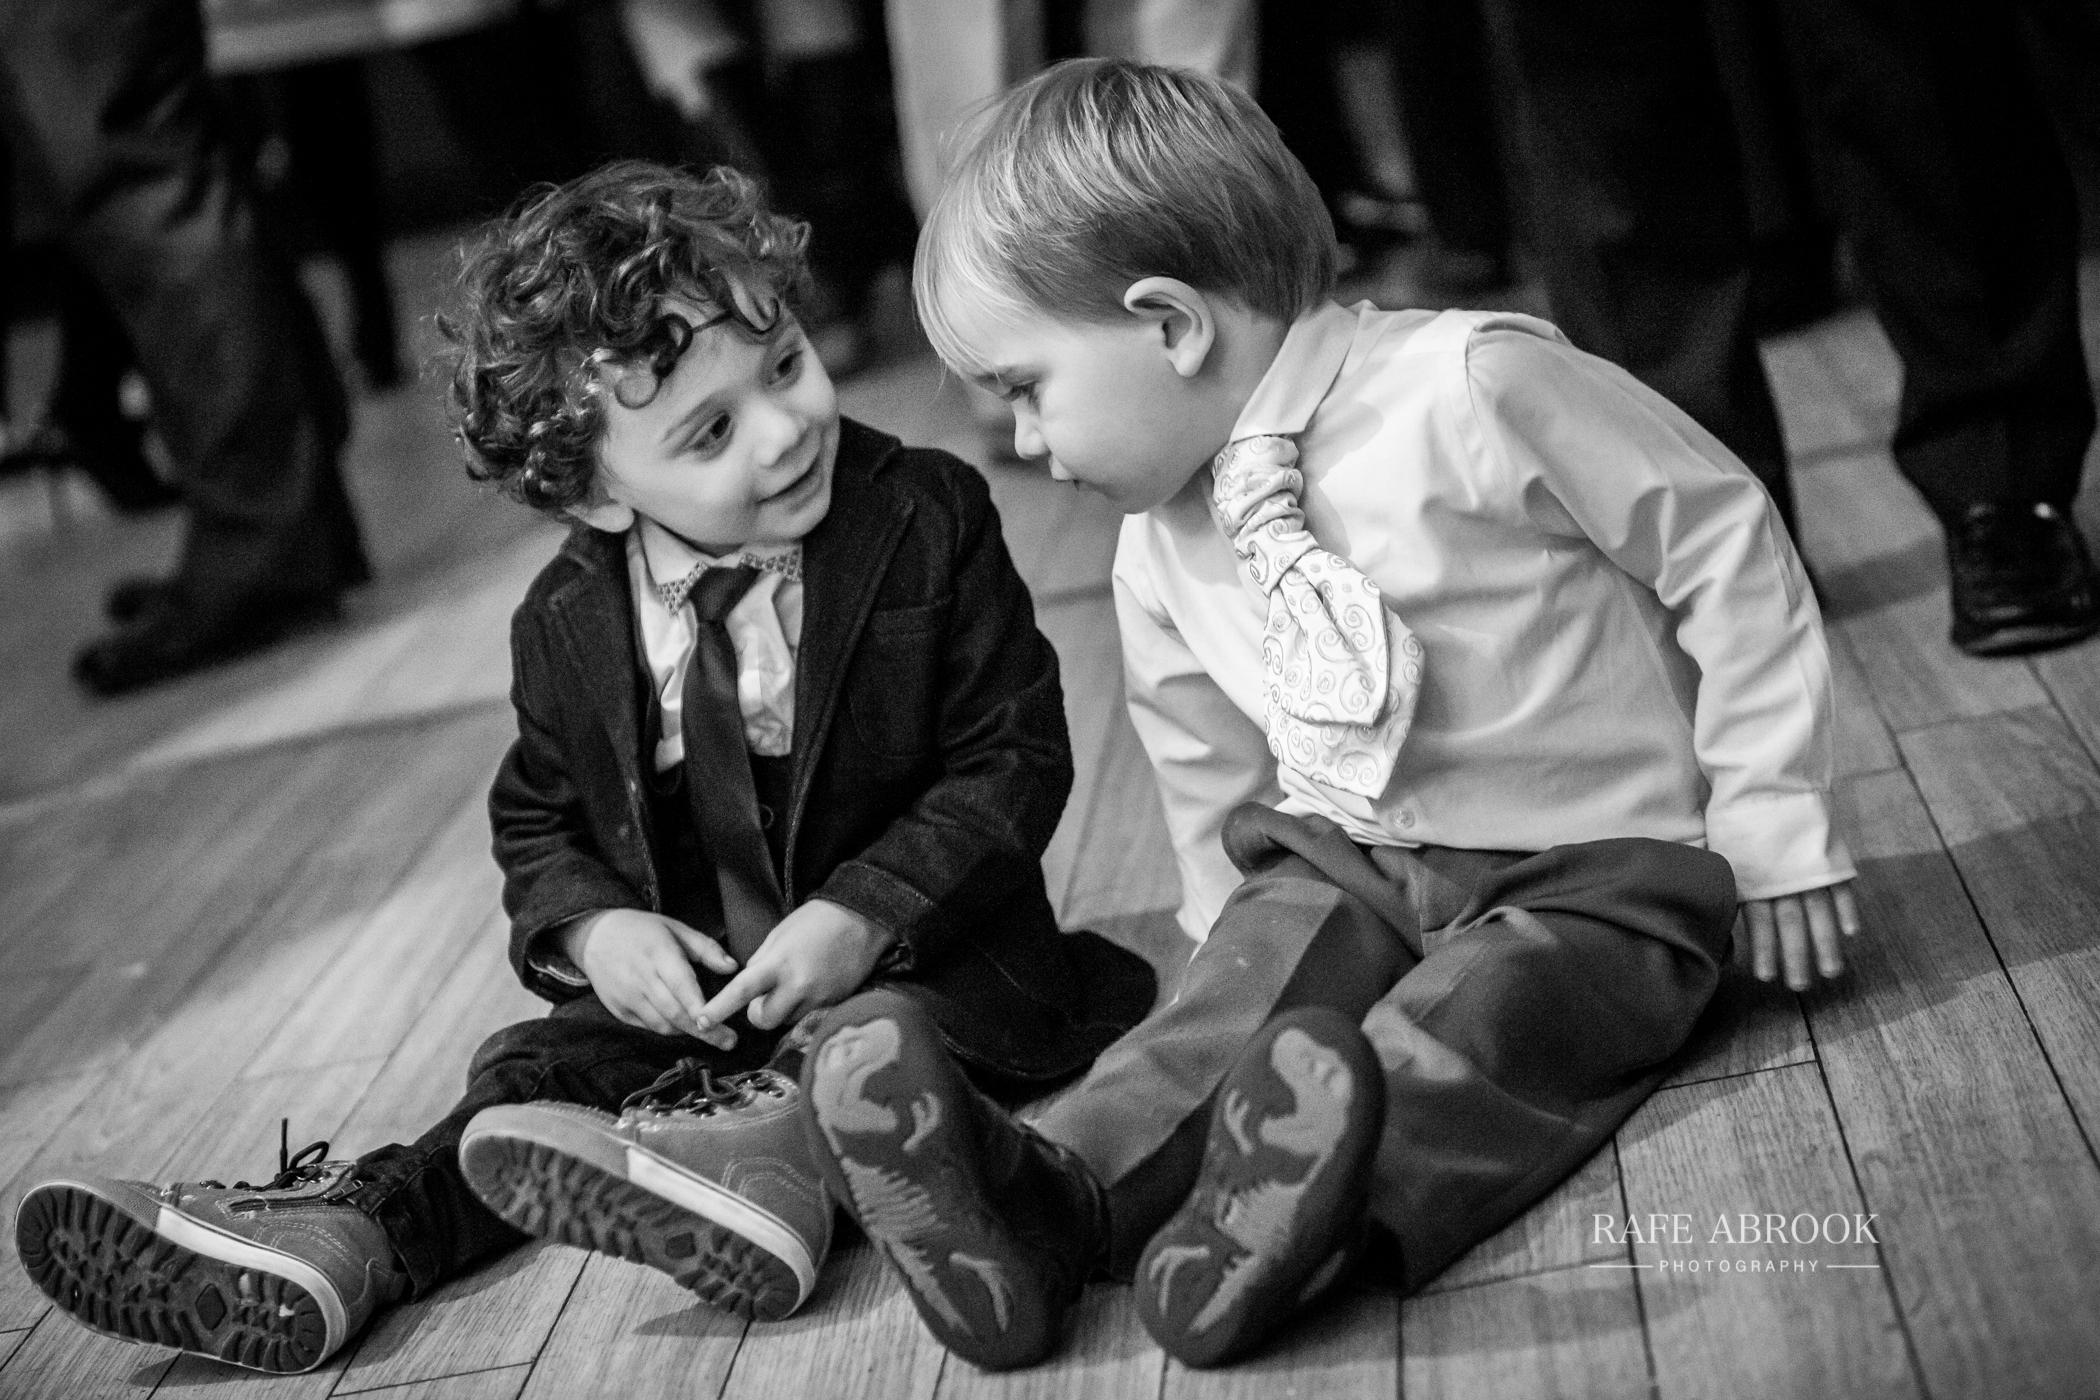 roma & pete wedding hampstead shenley hertfordshire -504.jpg